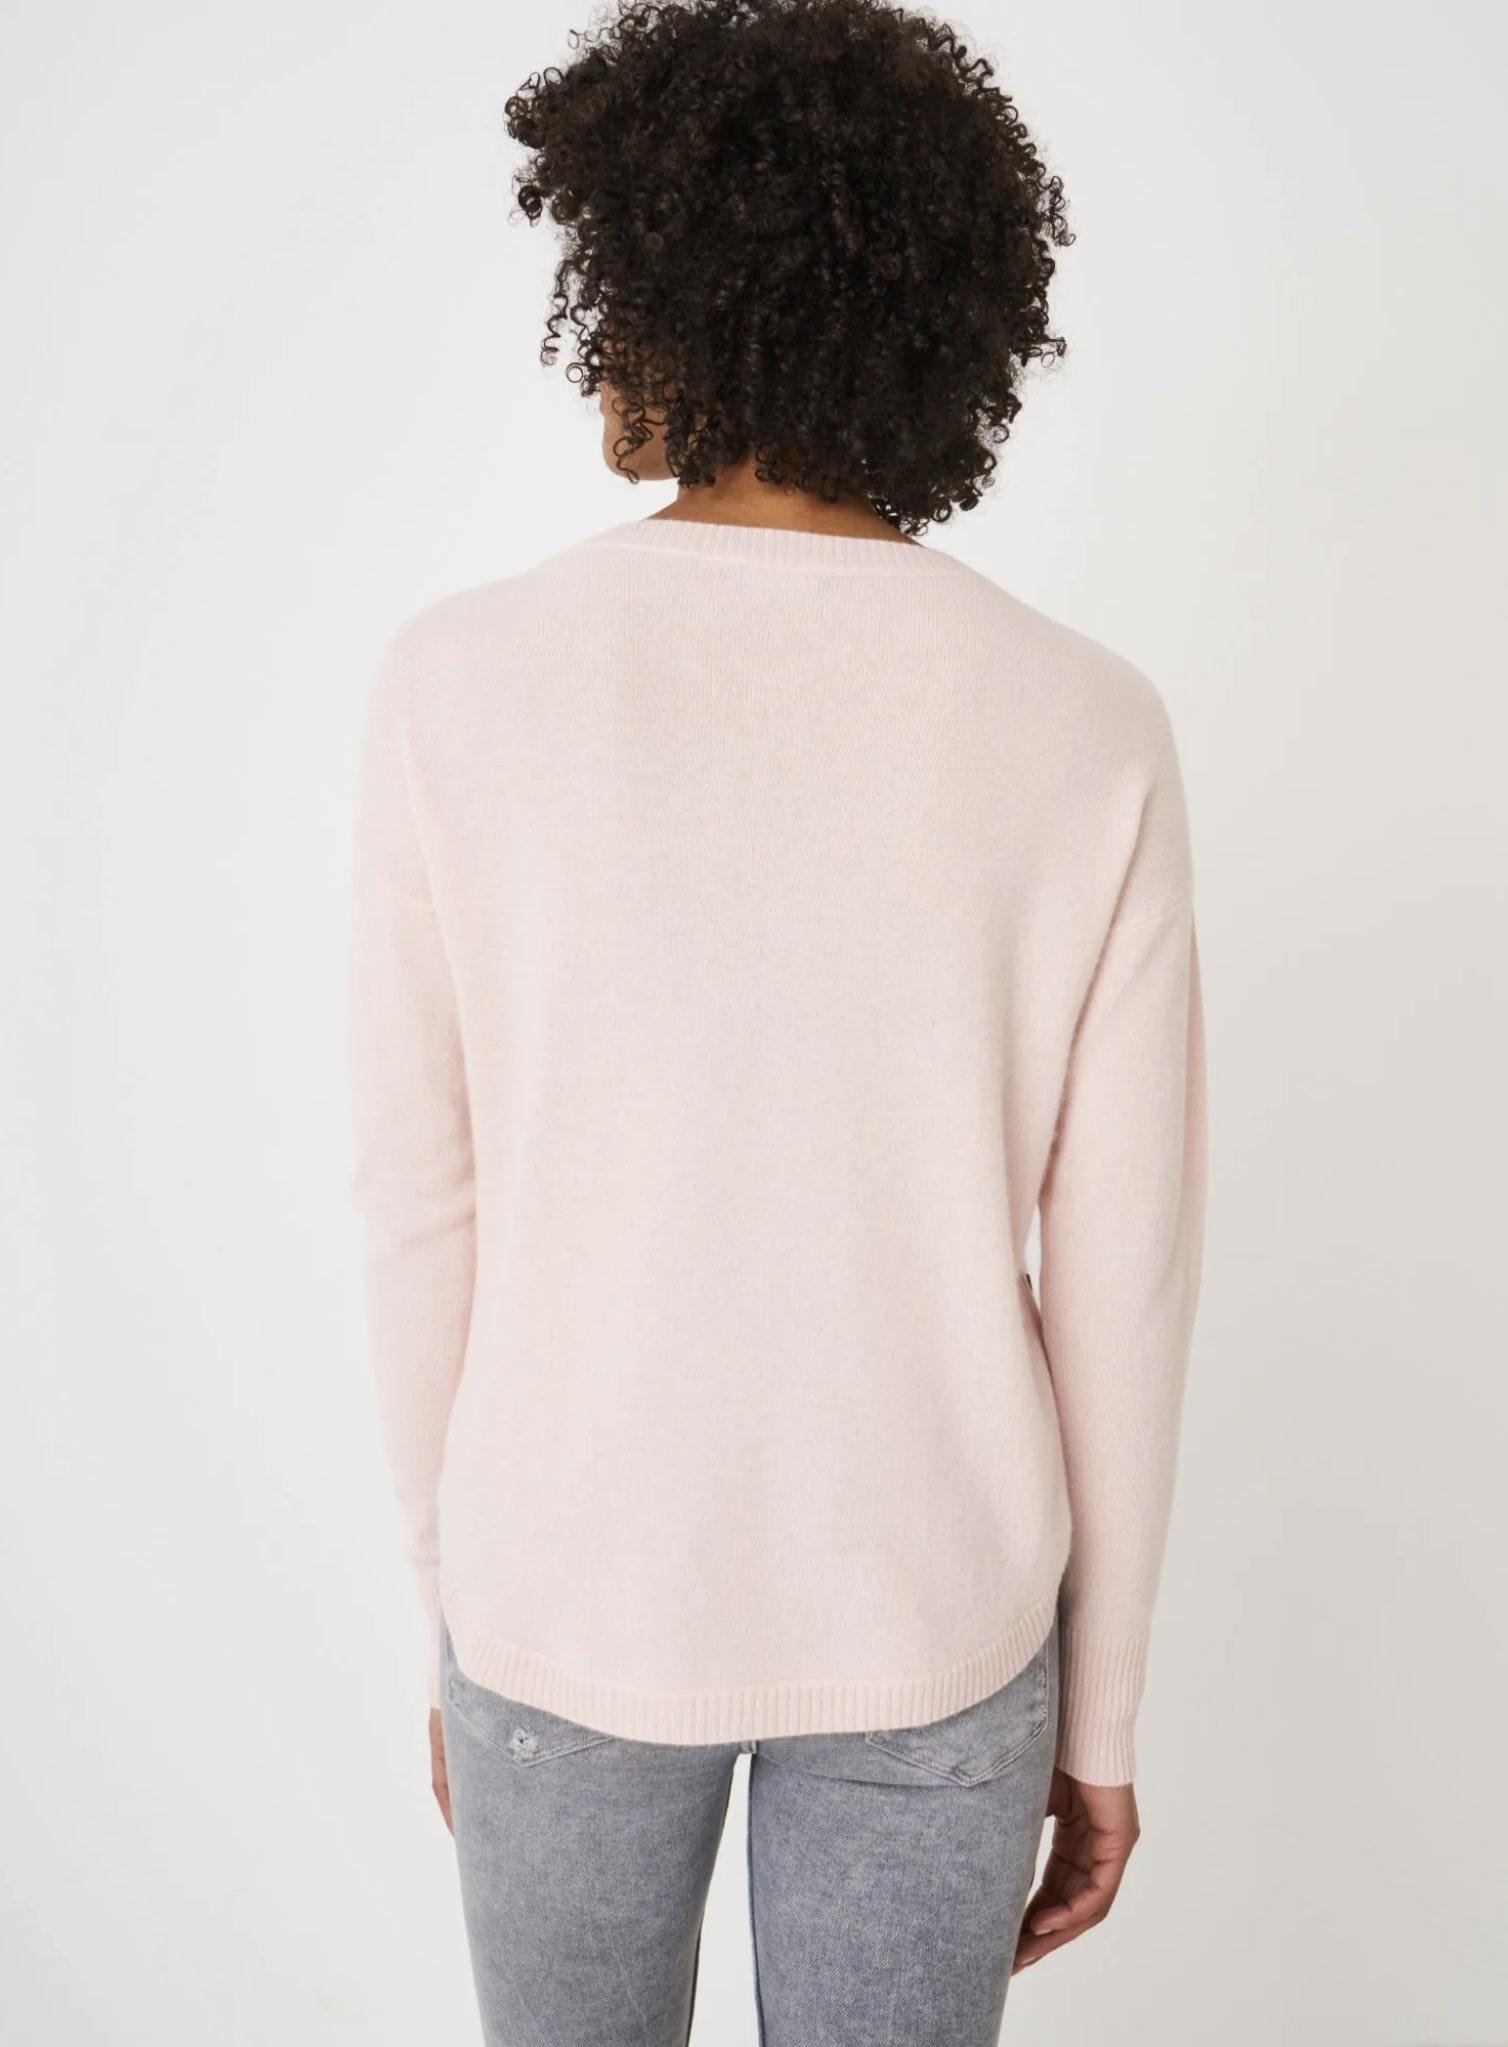 sweater repeat 100566-2